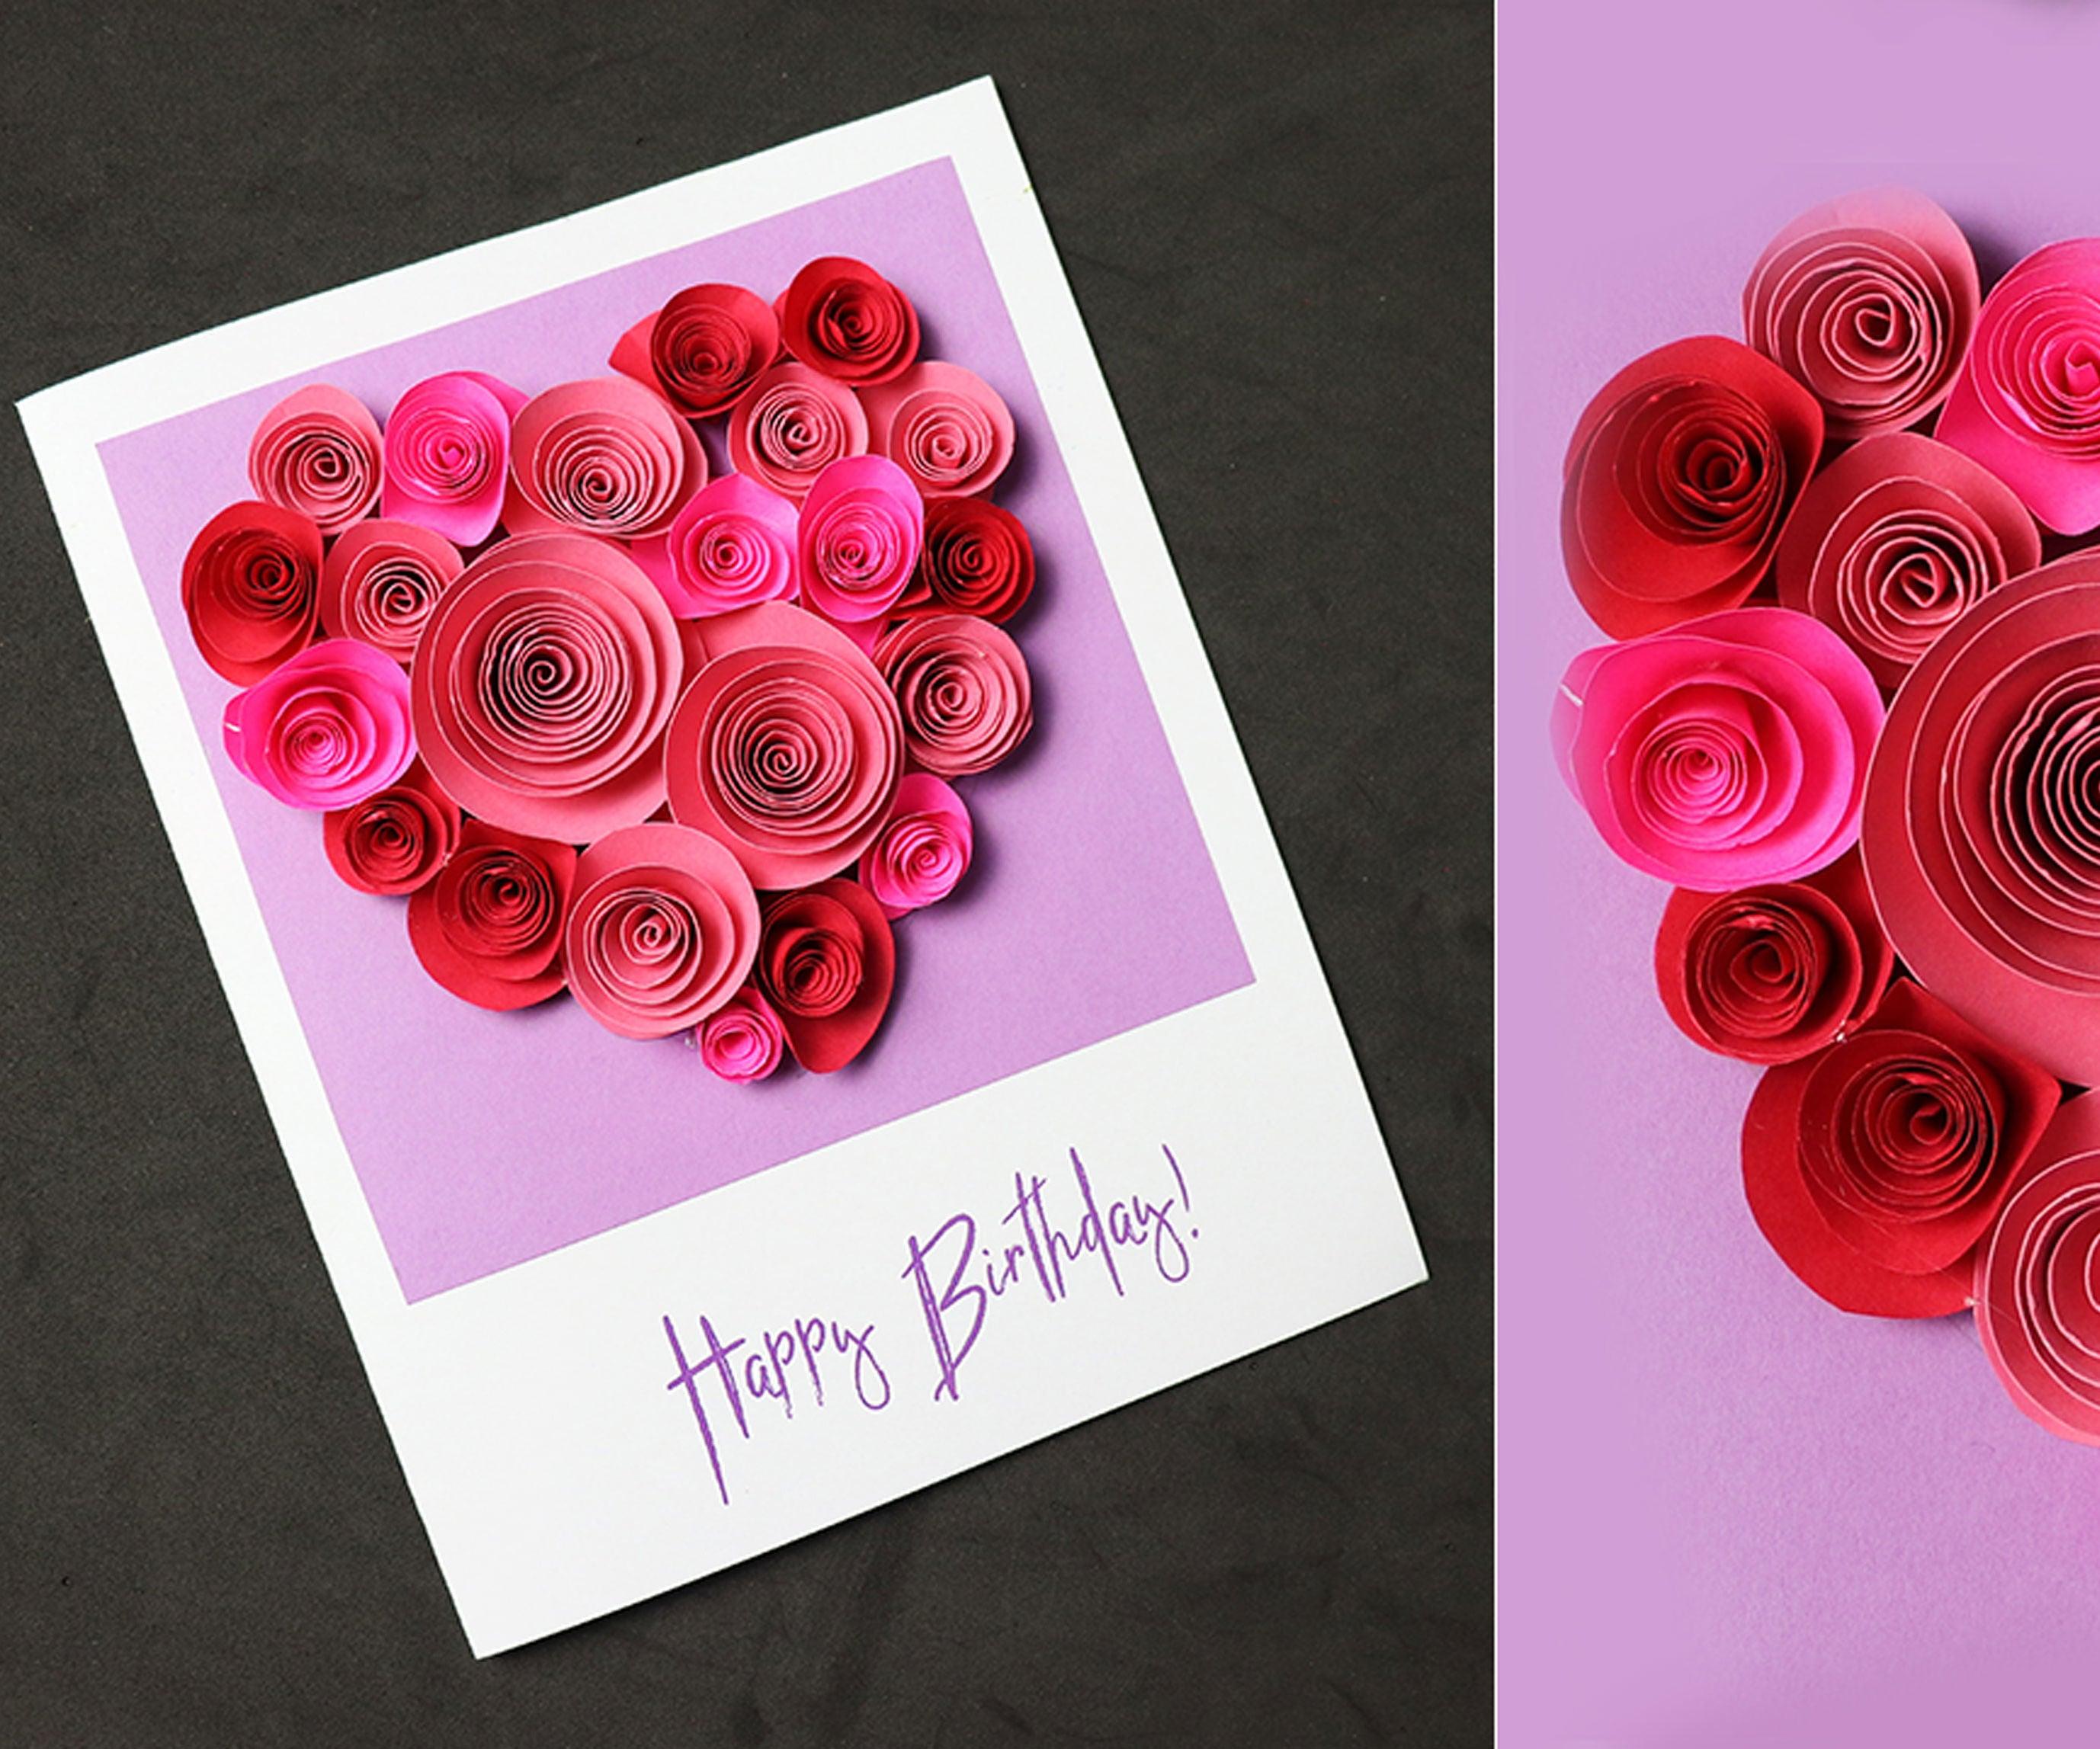 Beautiful Birthday Greeting Card Idea  Pop Up Rose Heart  DIY